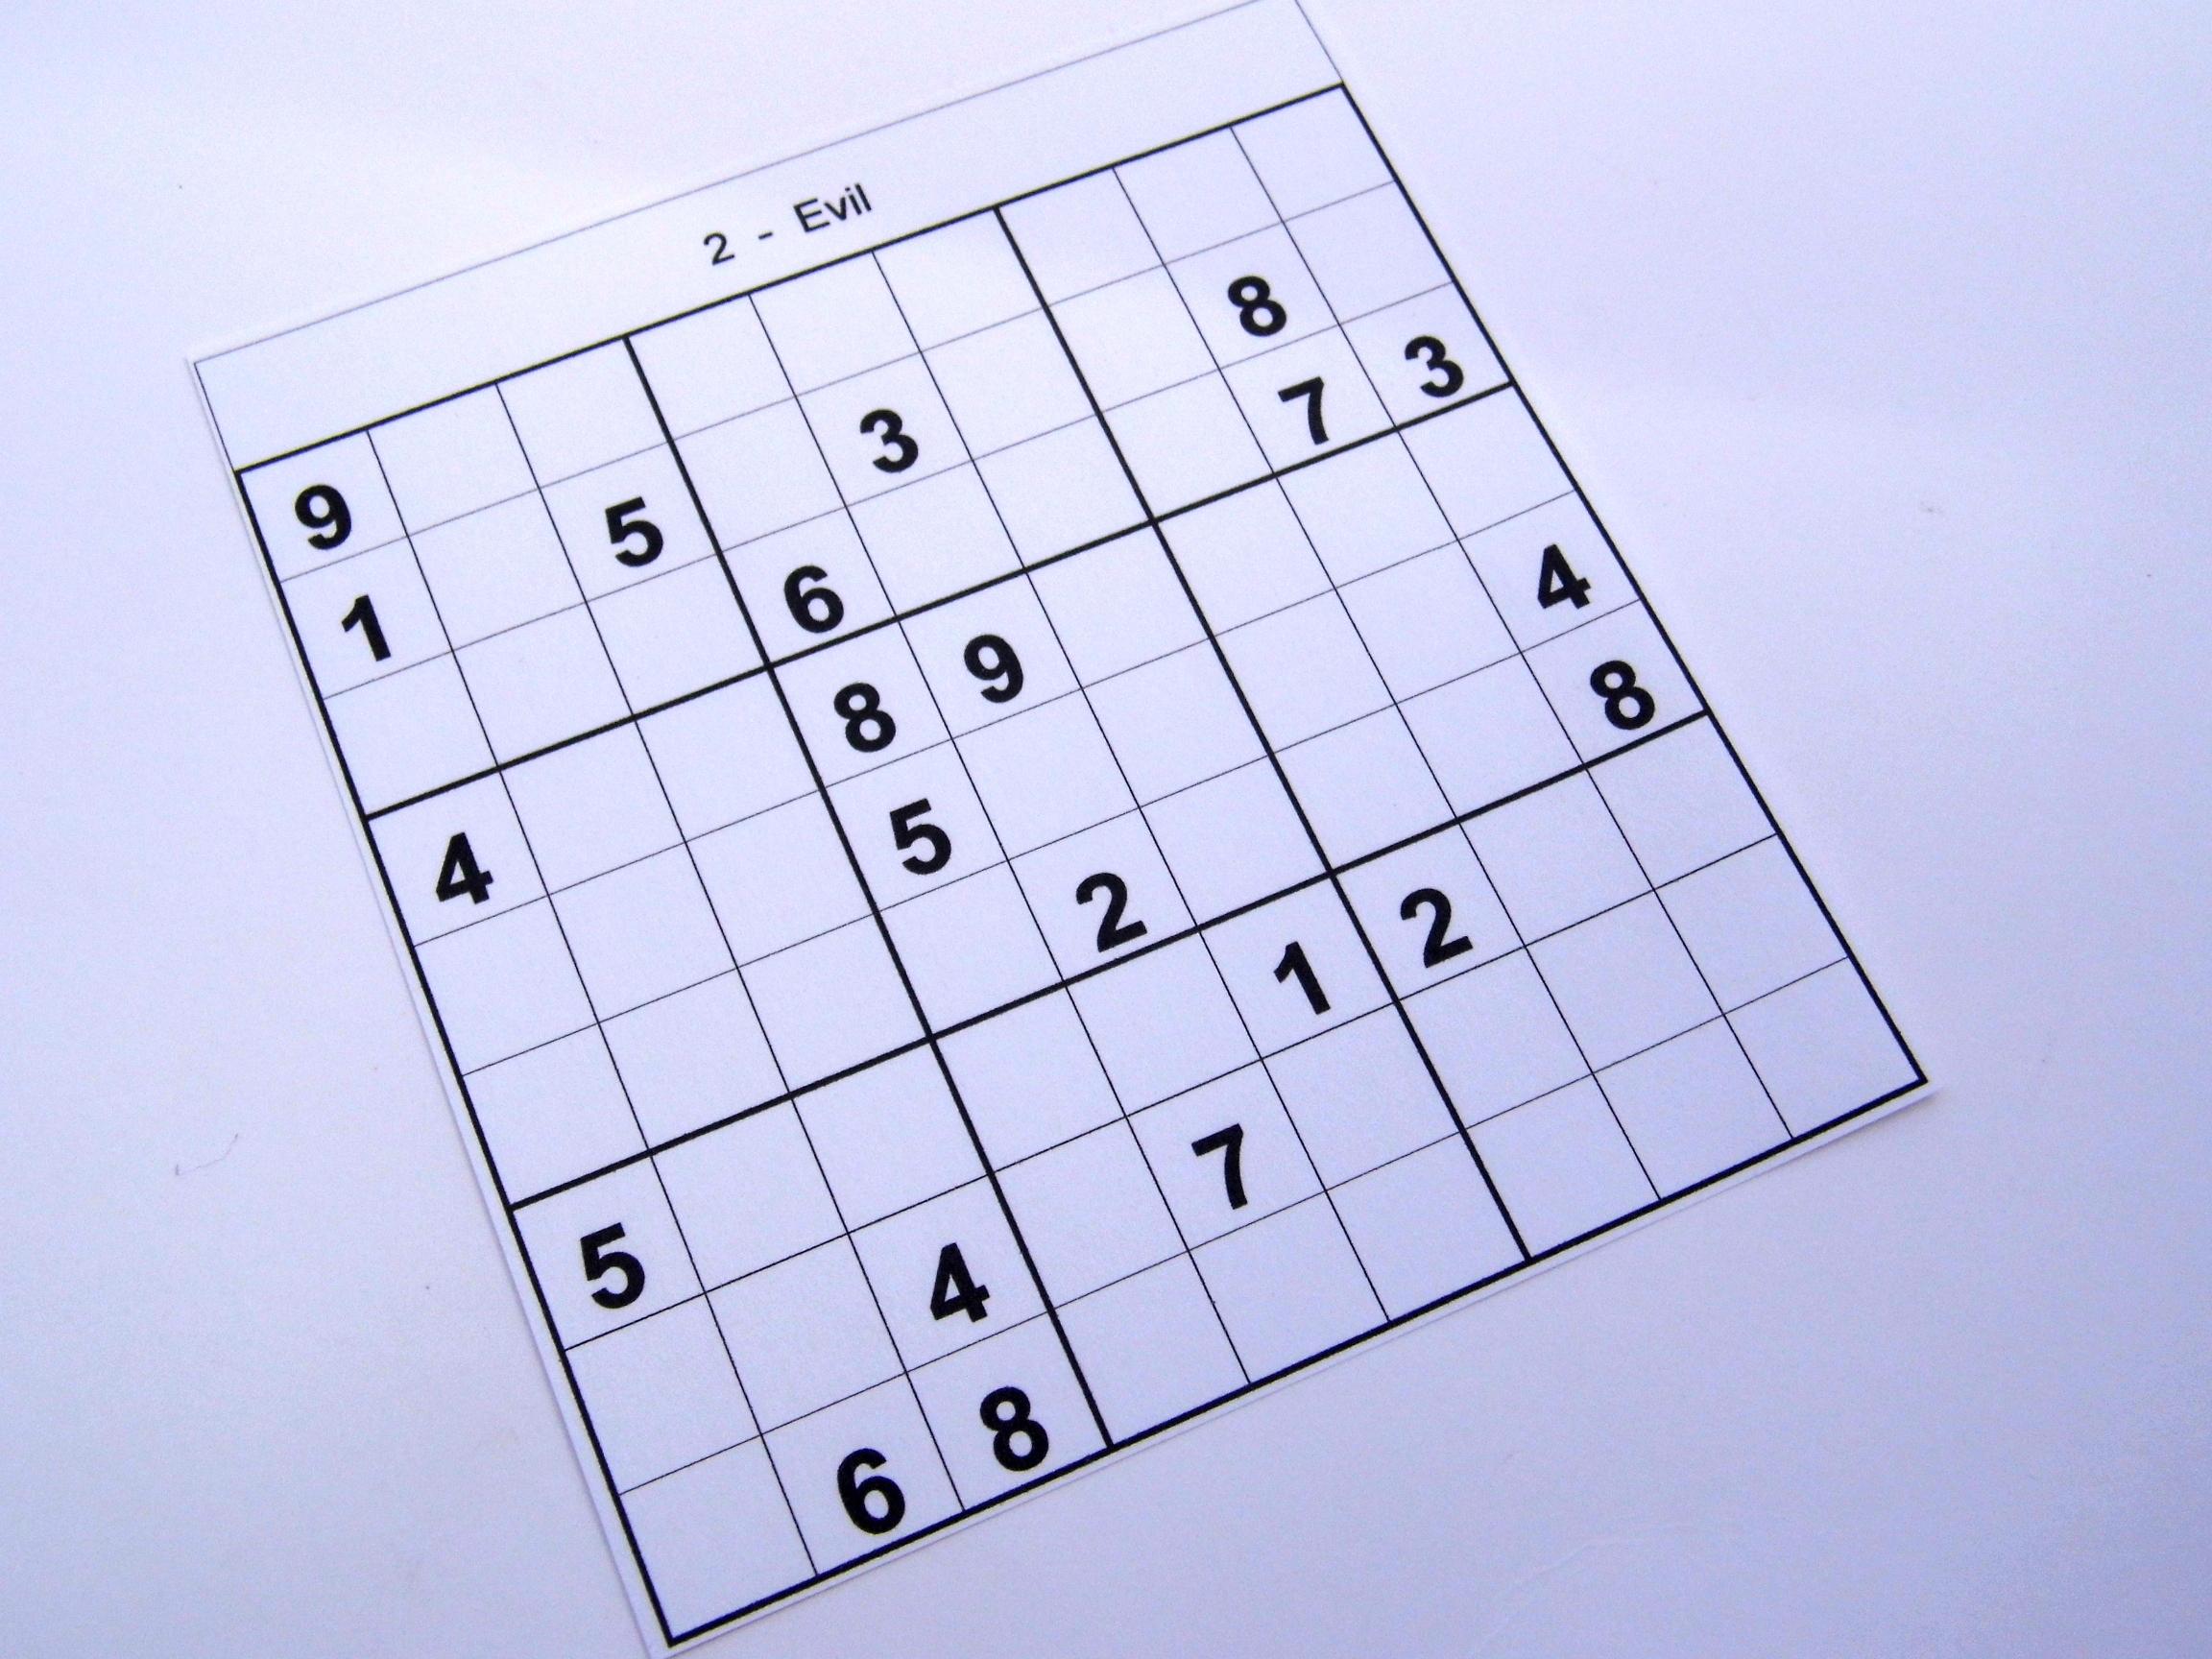 Archive Evil Puzzles – Free Sudoku Puzzles - Free Printable Sudoku 6 - Printable Sudoku Puzzles 2 Per Page